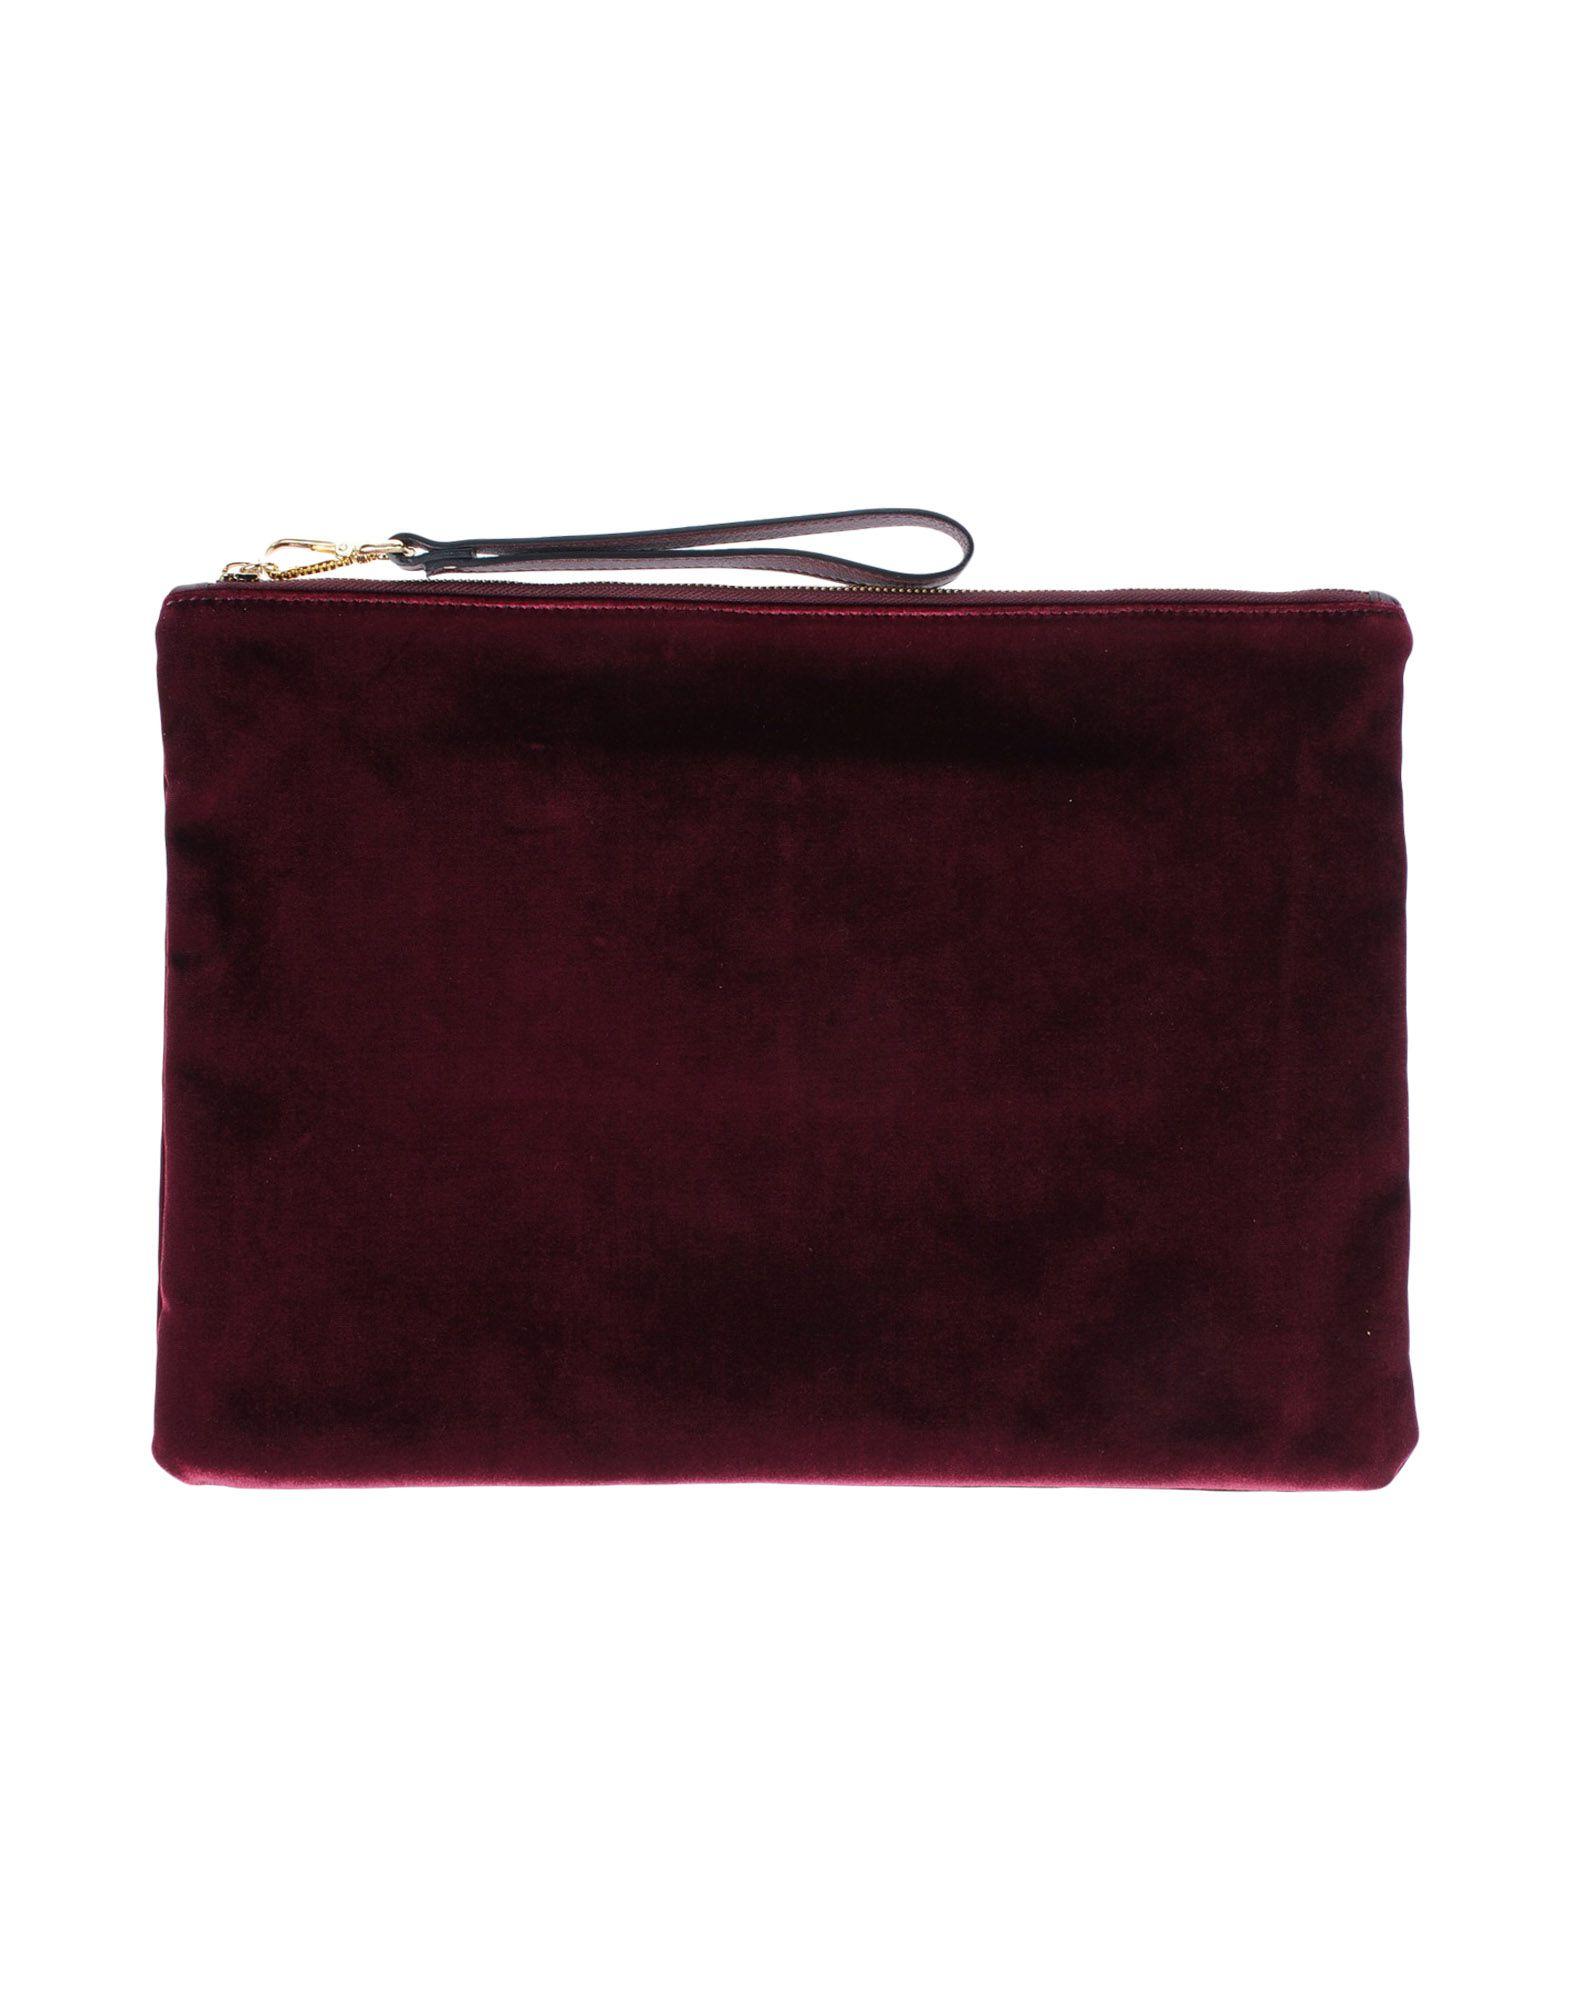 AVENUE 67 Handbags in Deep Purple